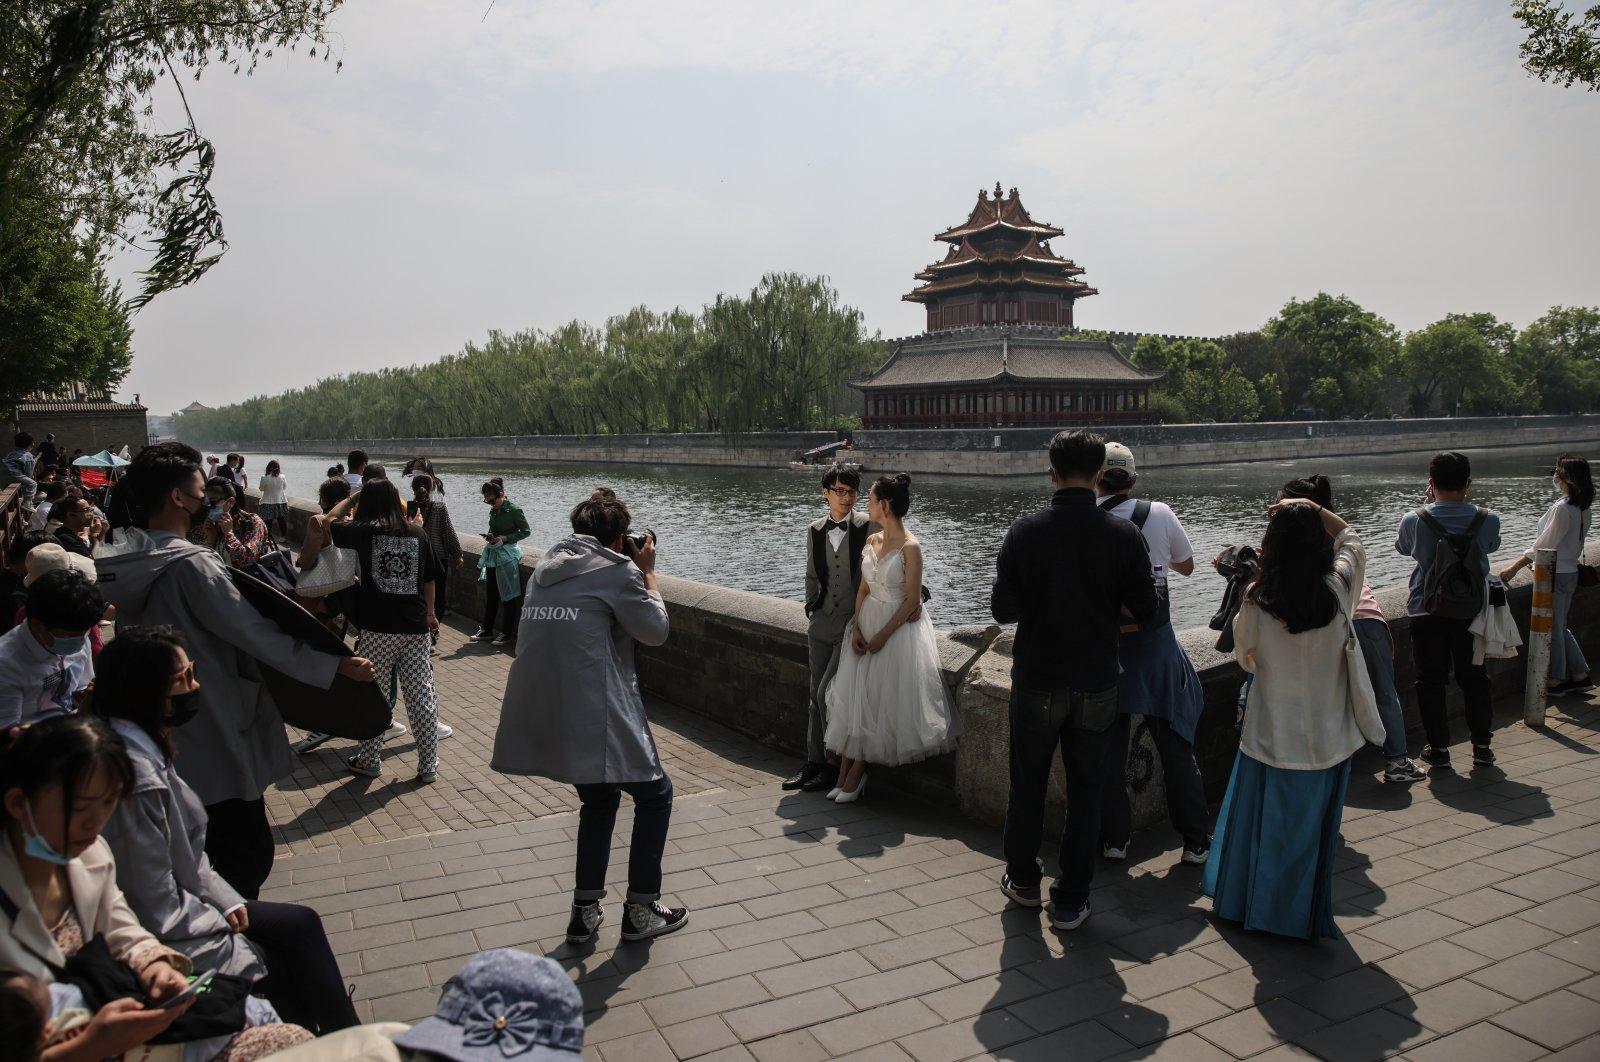 A couple pose for their pre-wedding photos near the Forbidden City in Beijing, China, May 3, 2021. (EPA Photo)